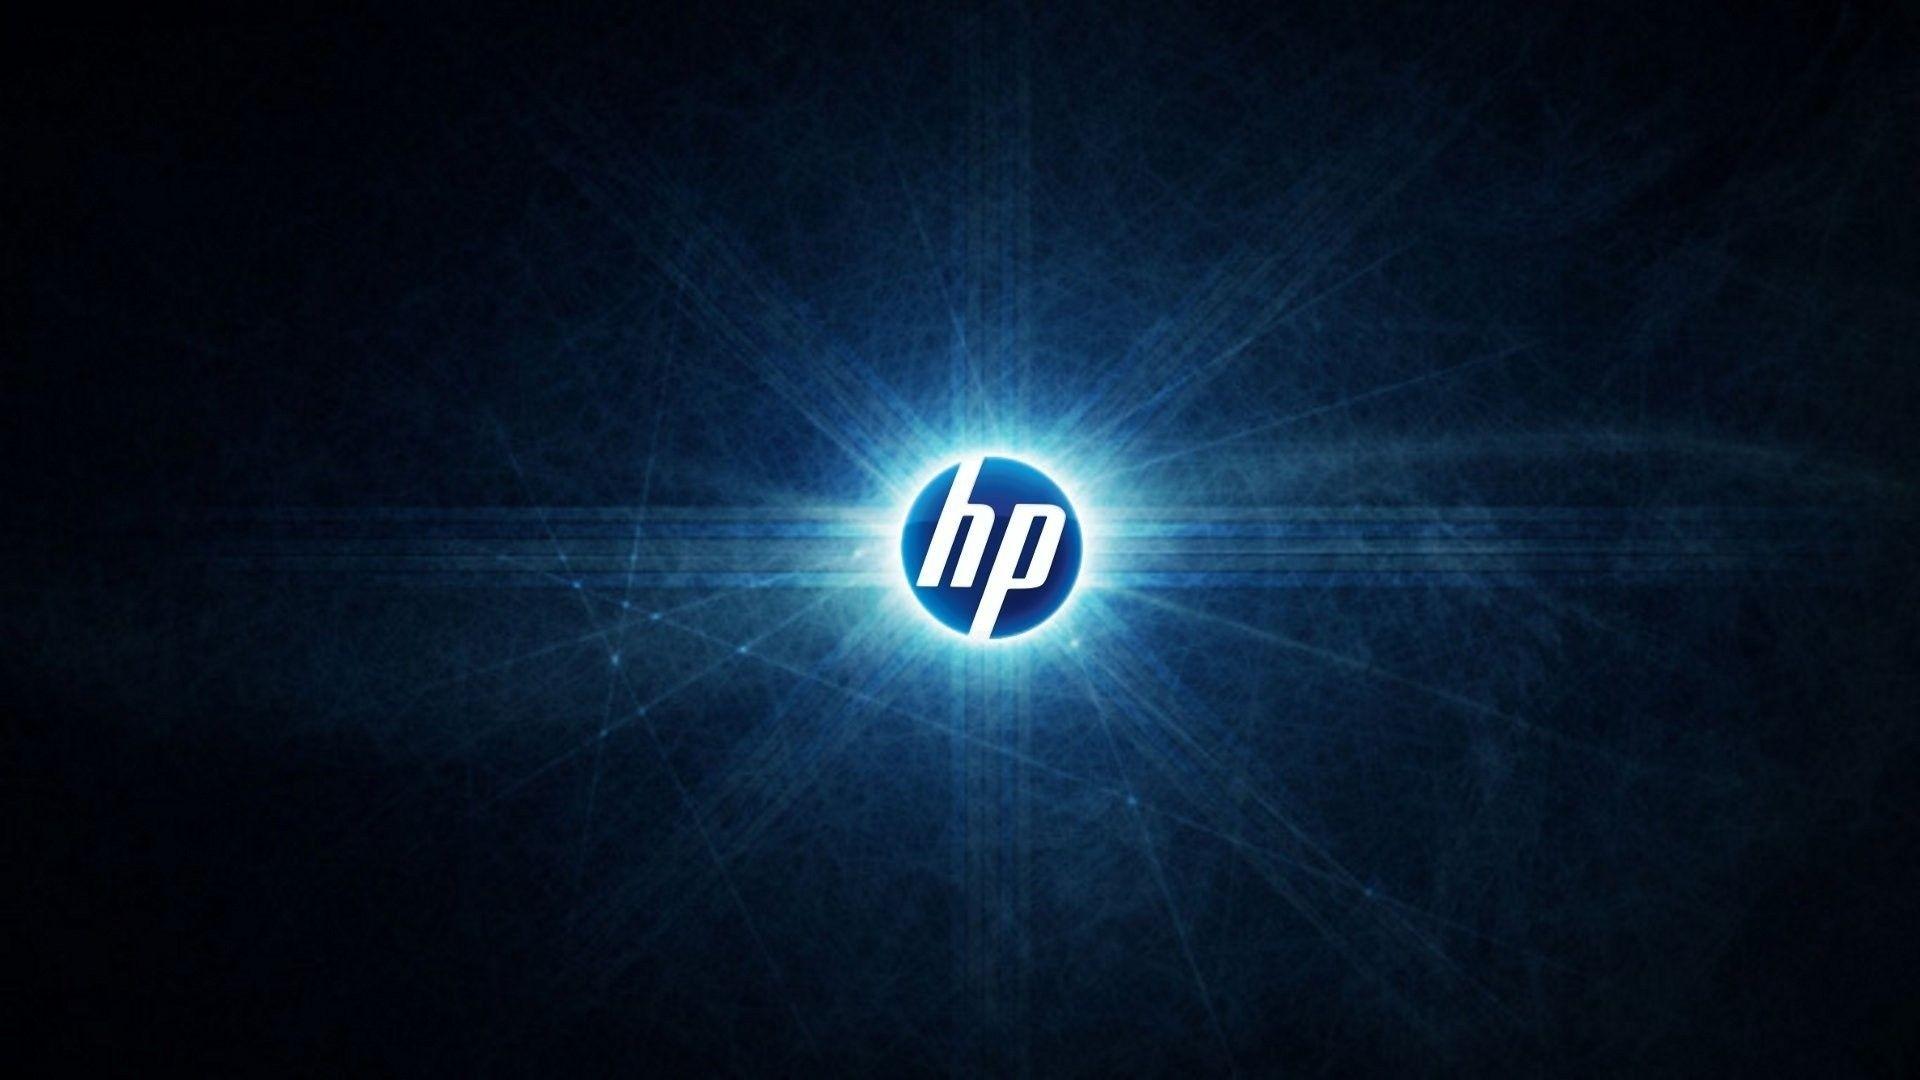 HP HQ Definition Live Wallpaper – DSC18 Screenshot